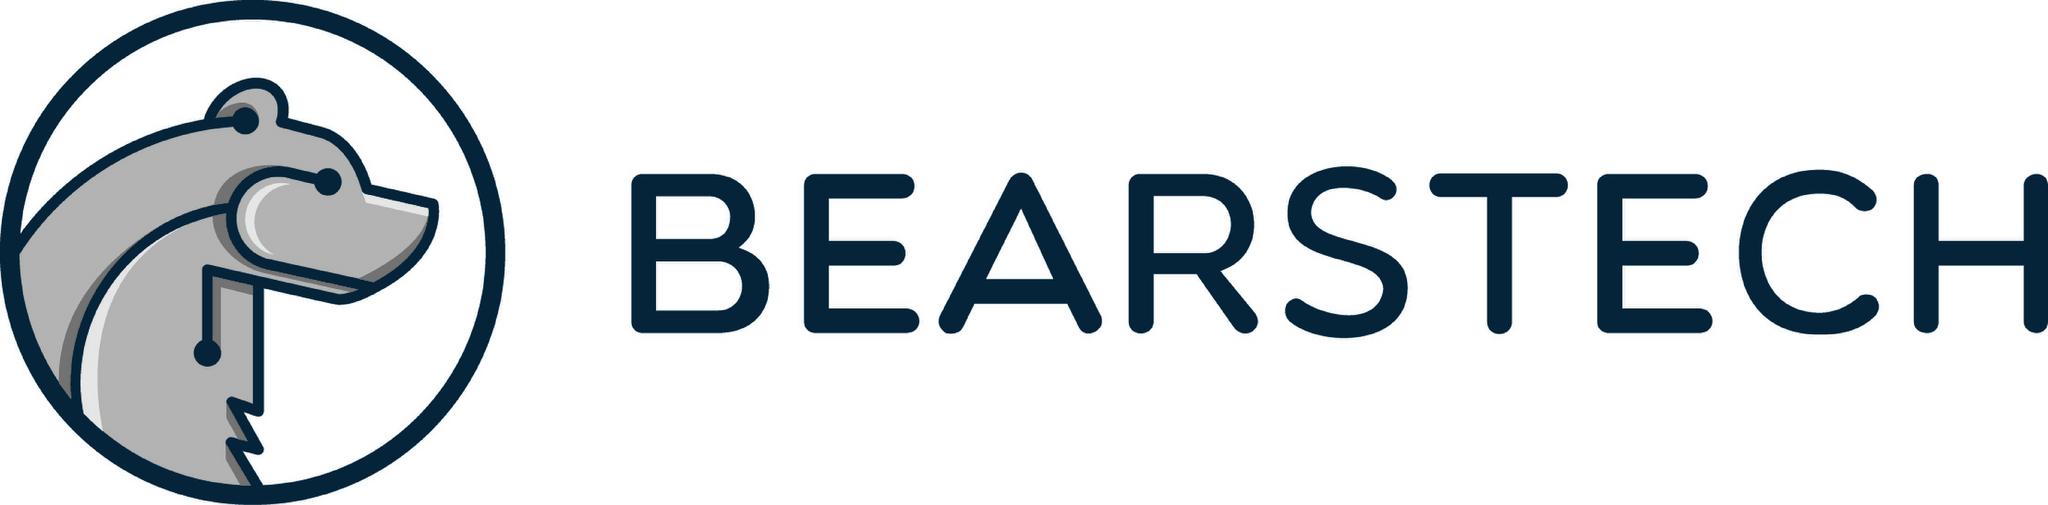 Bearstech